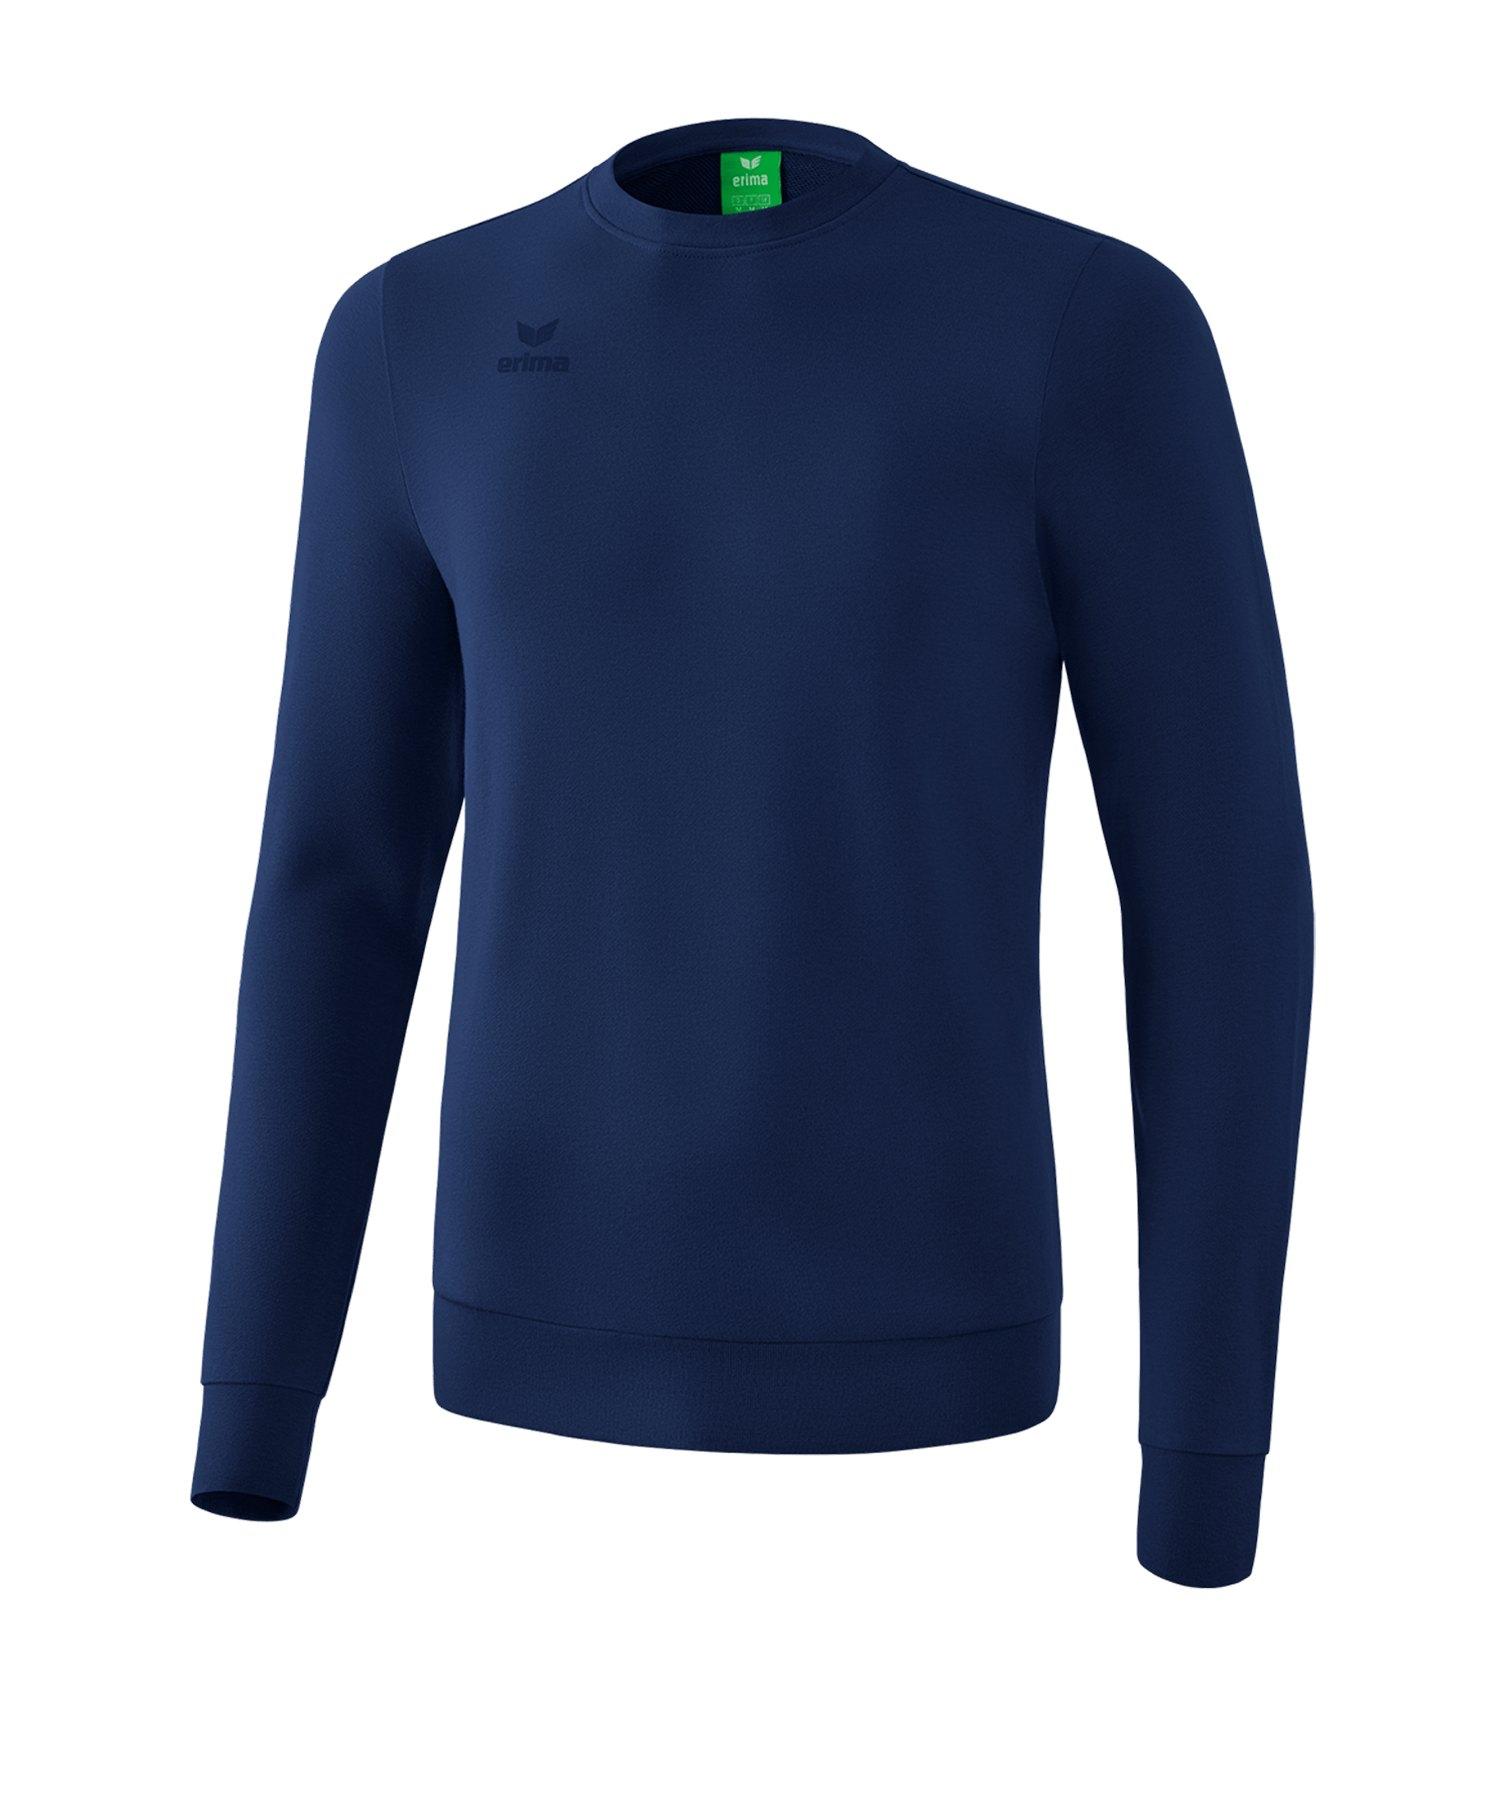 Erima Basic Sweatshirt Dunkelblau - blau